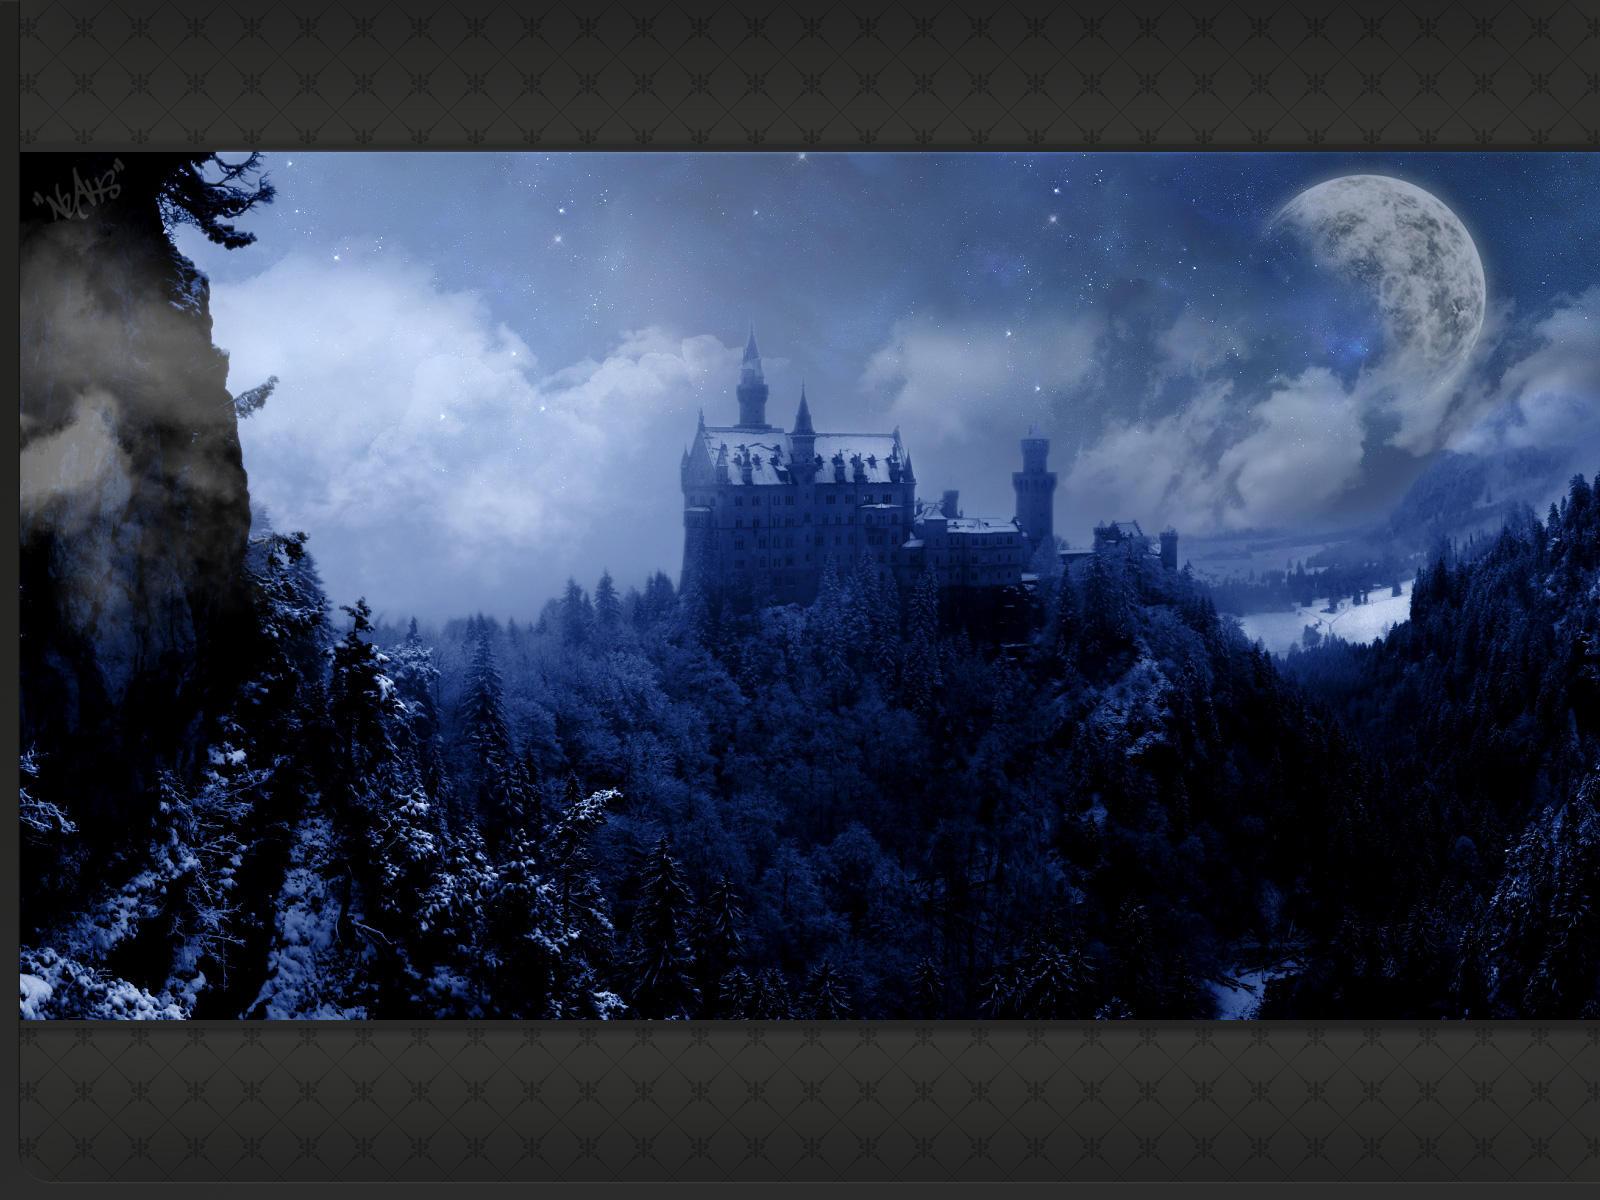 Mystic Castle by nuaHs on DeviantArt